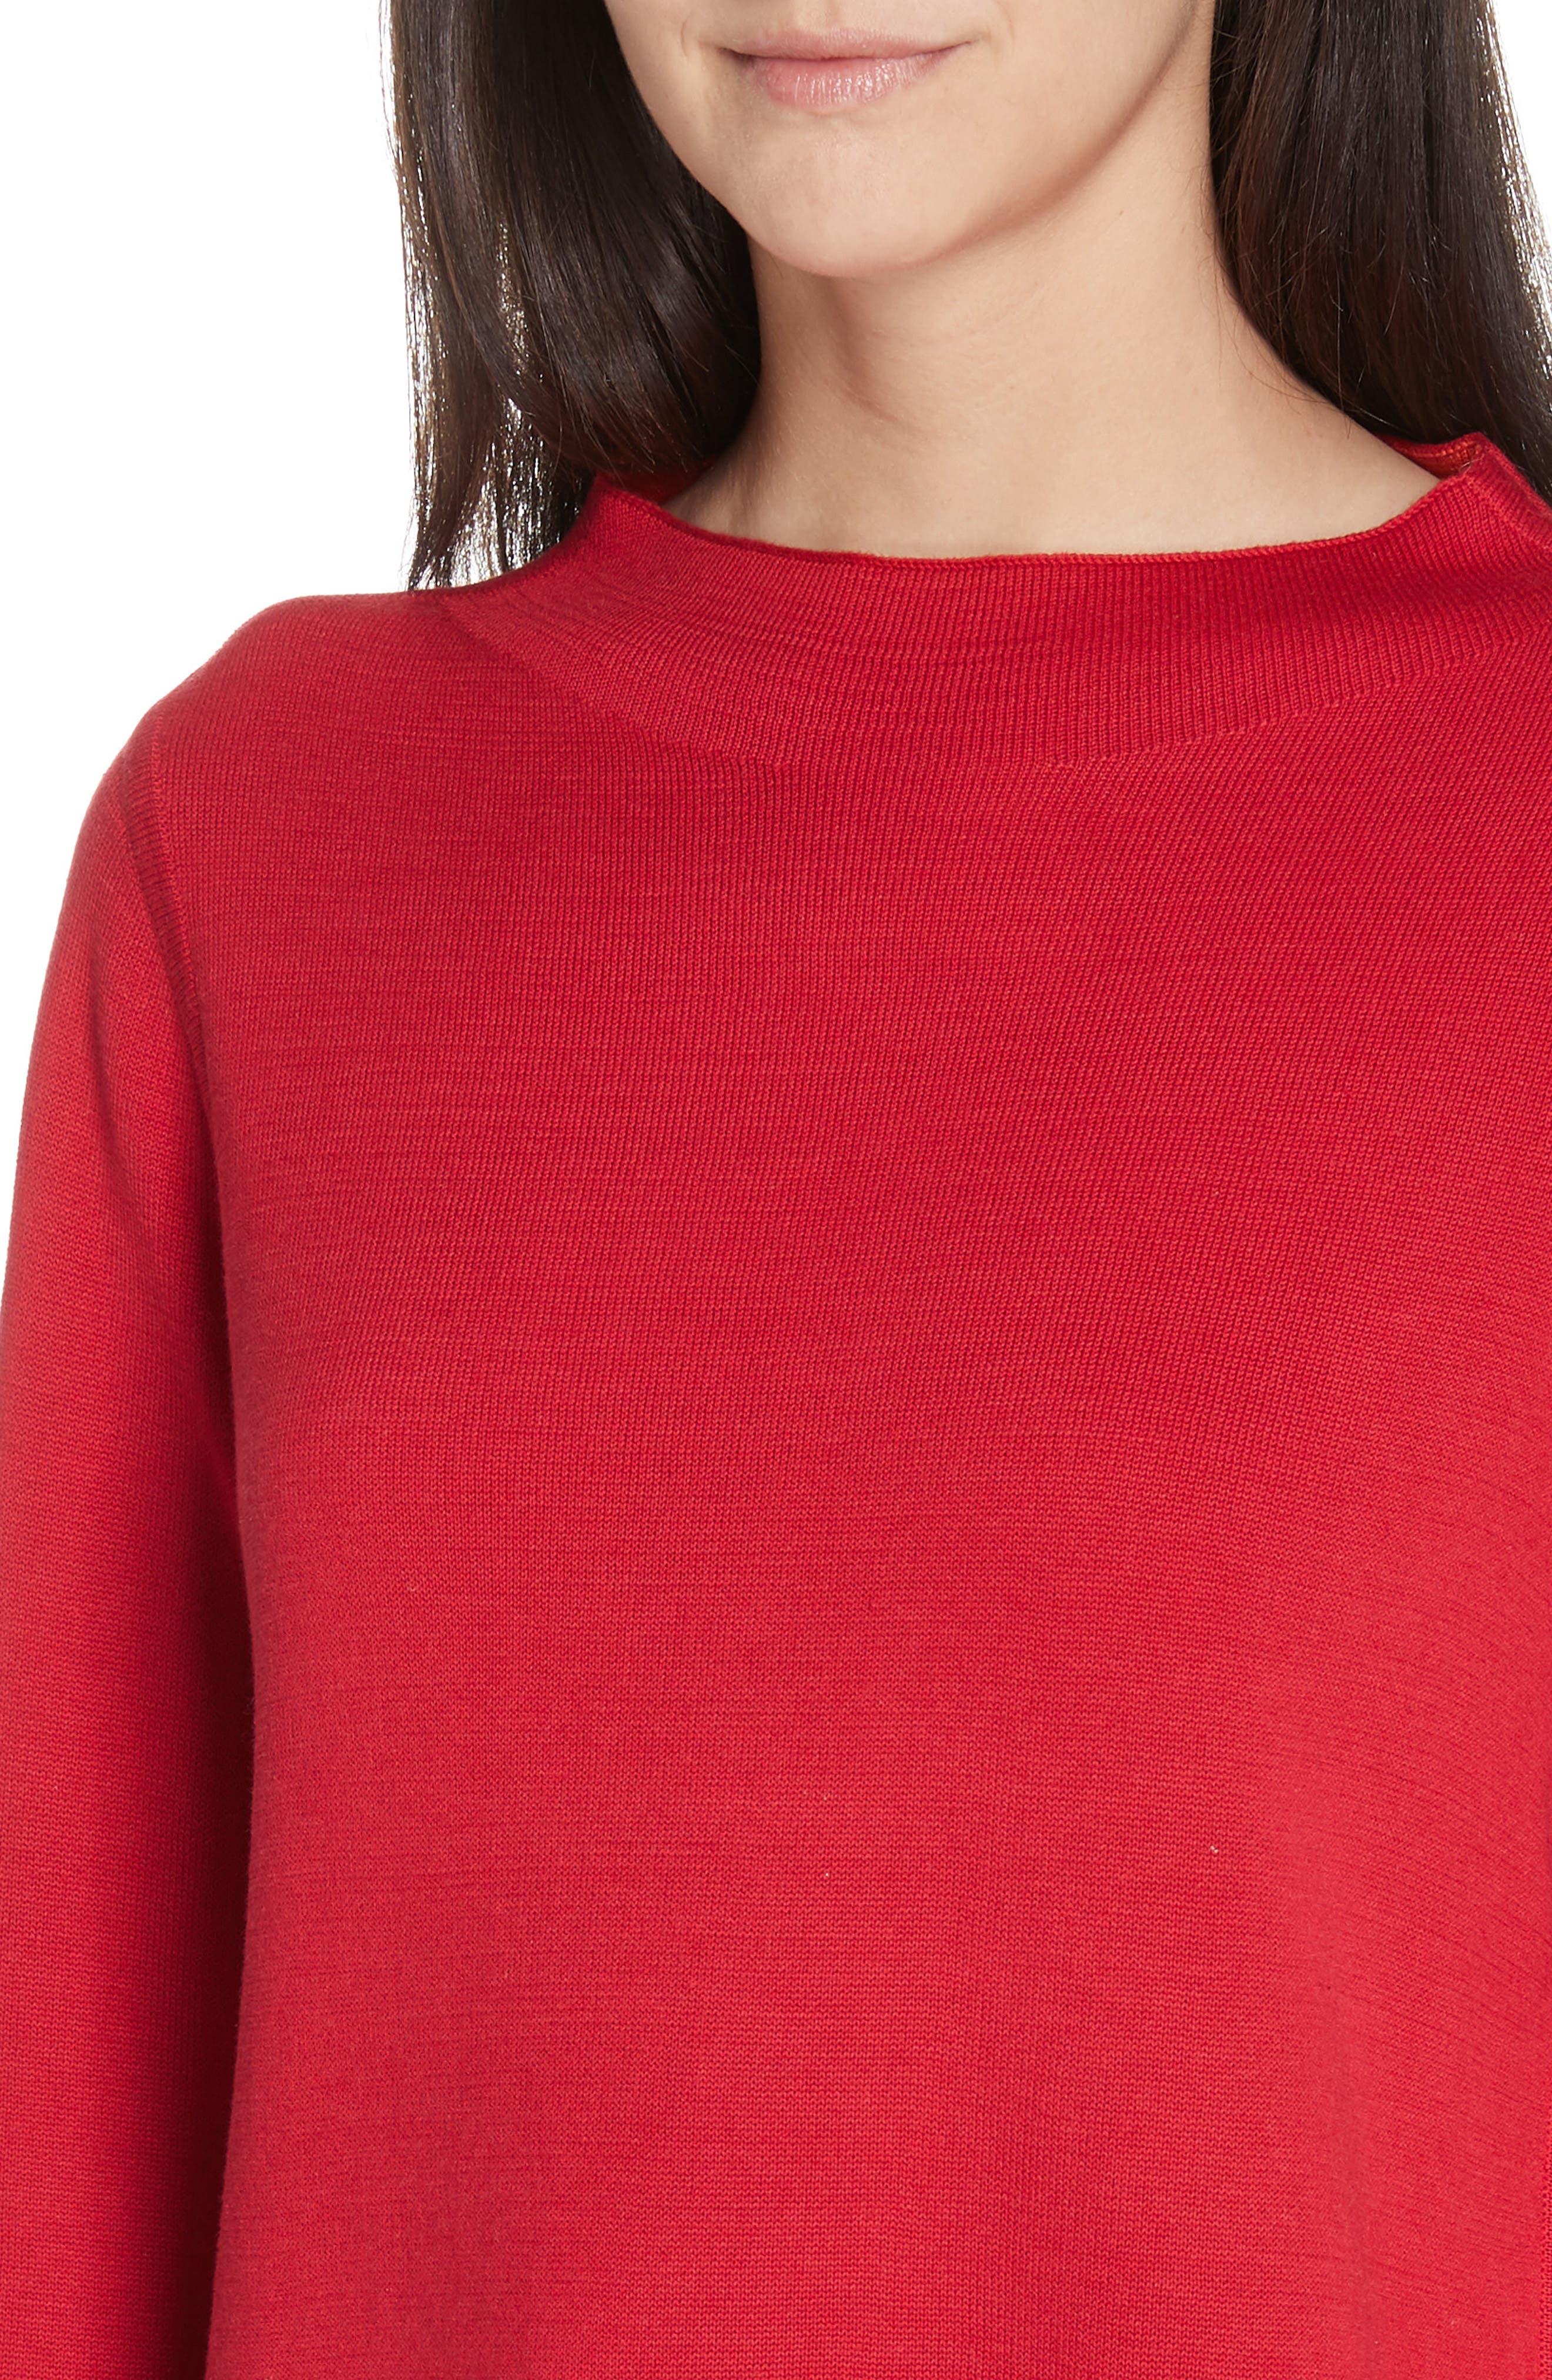 EILEEN FISHER, Reversilble Silk Blend Sweater, Alternate thumbnail 5, color, LACQUER